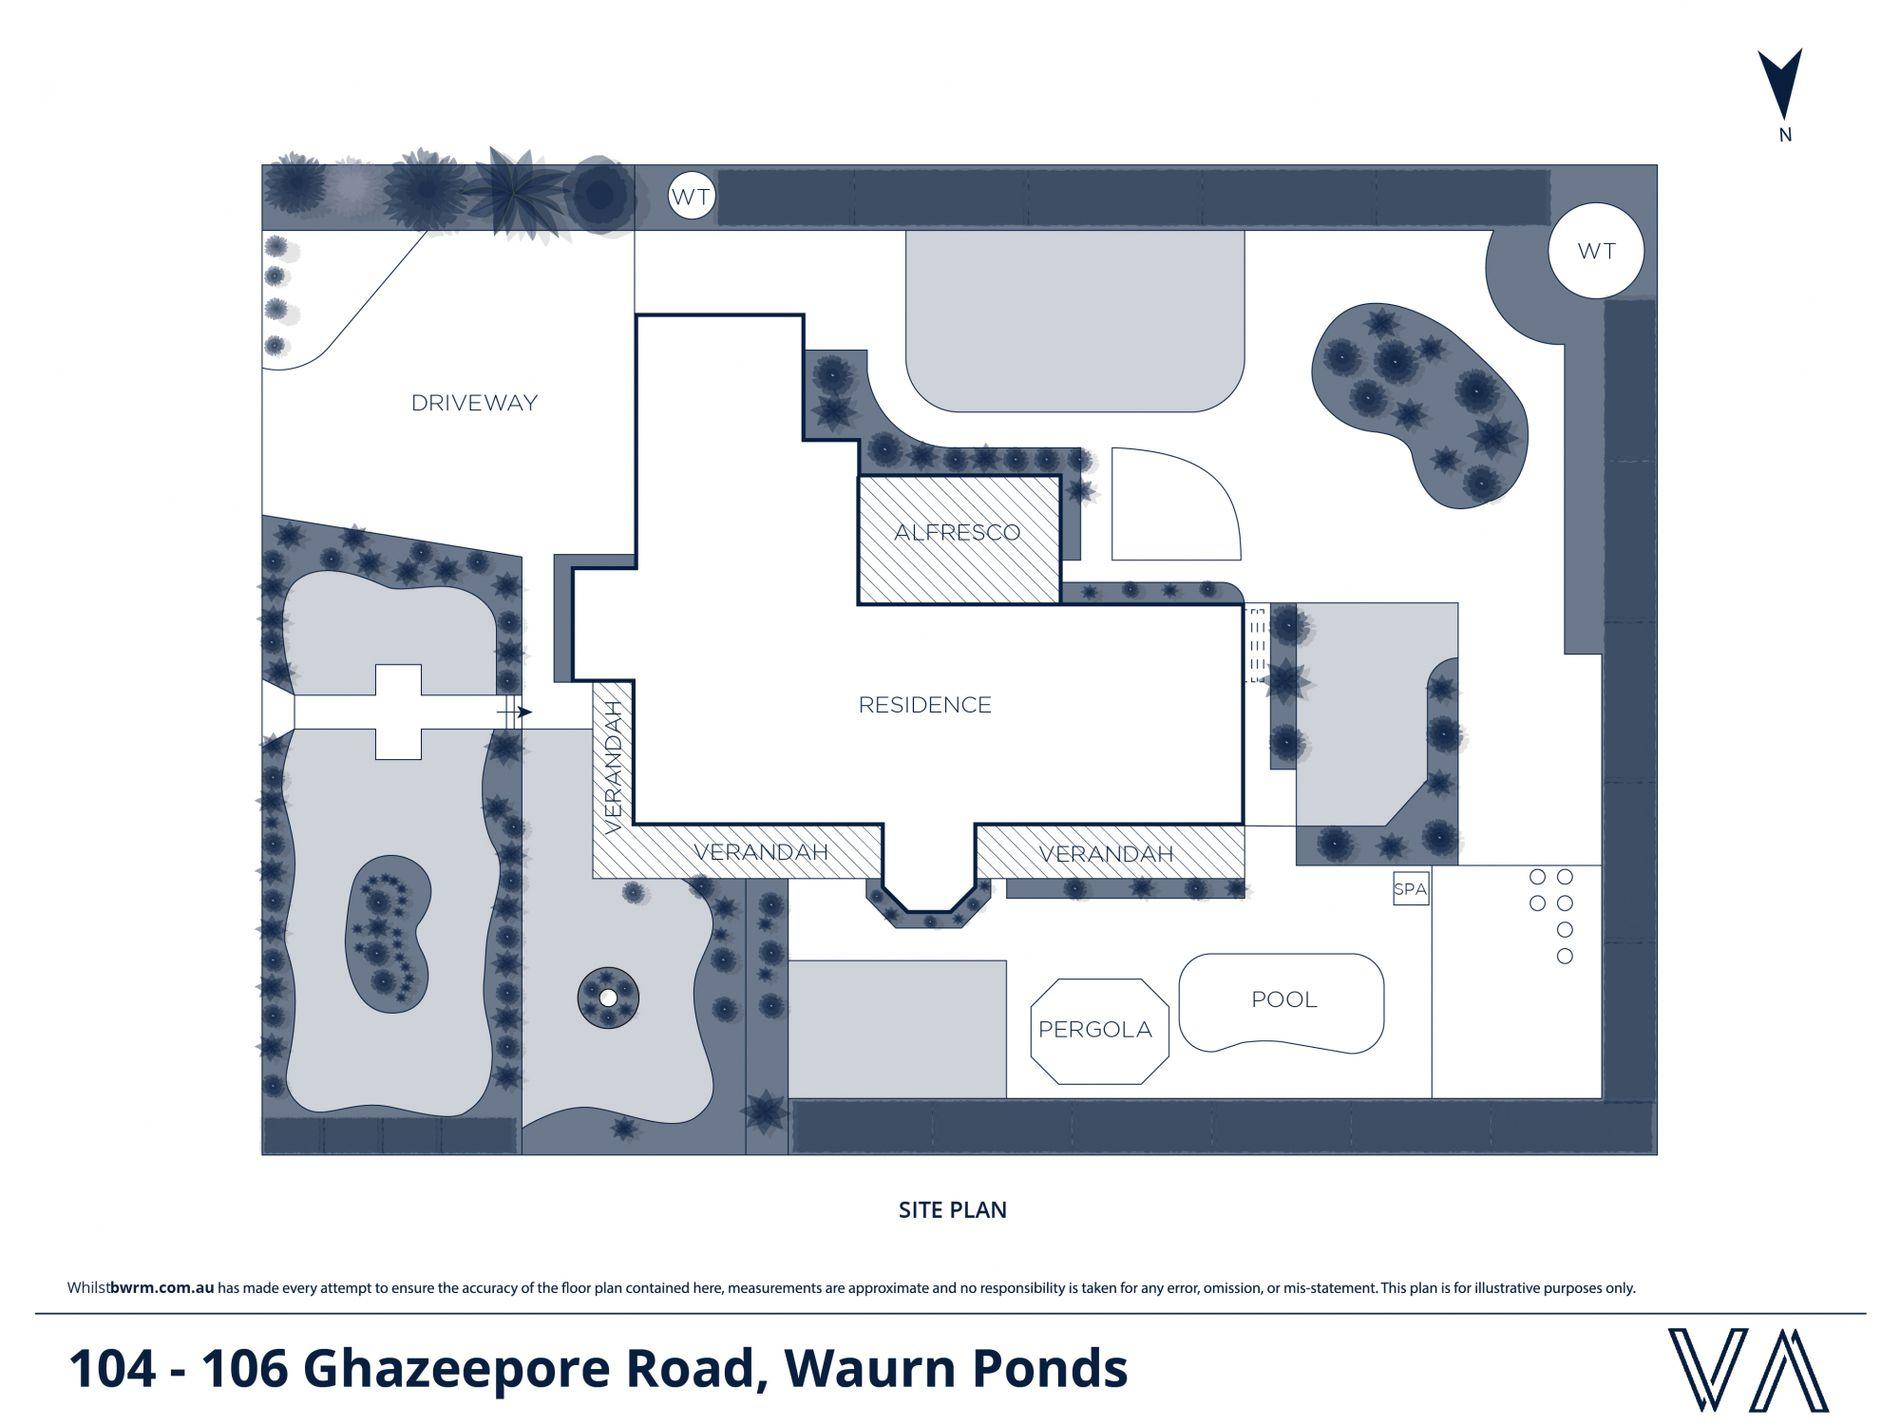 104-106 Ghazeepore Road, Waurn Ponds